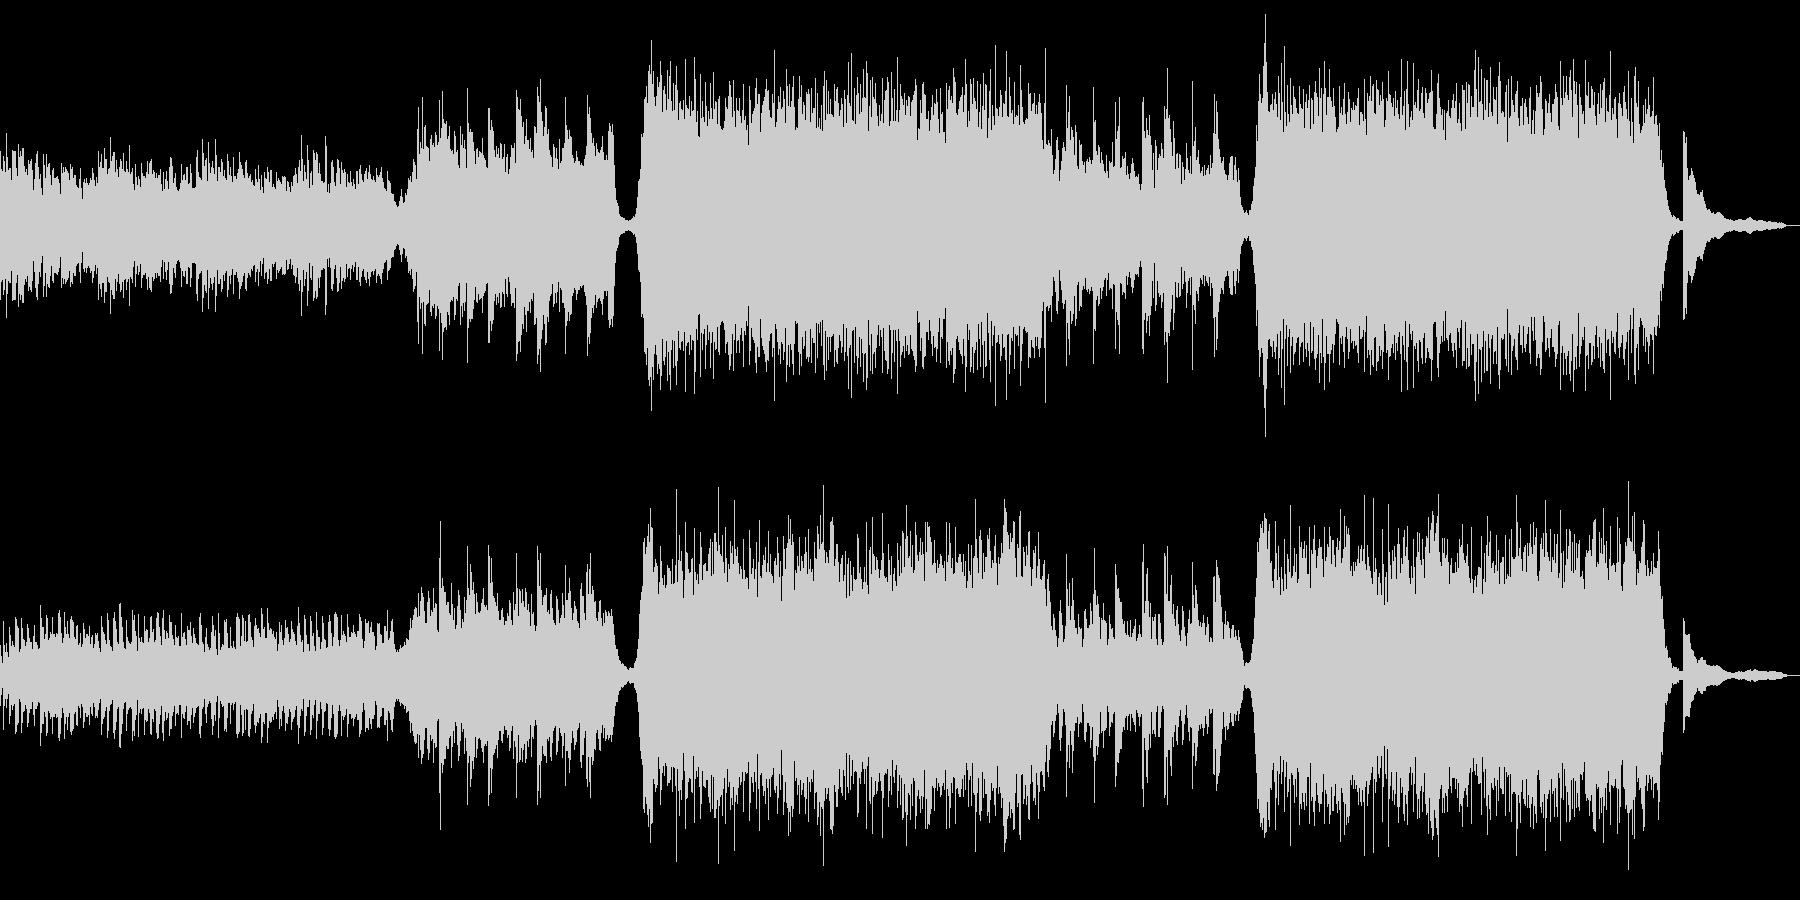 CM向けシネマティックオーケストラの未再生の波形